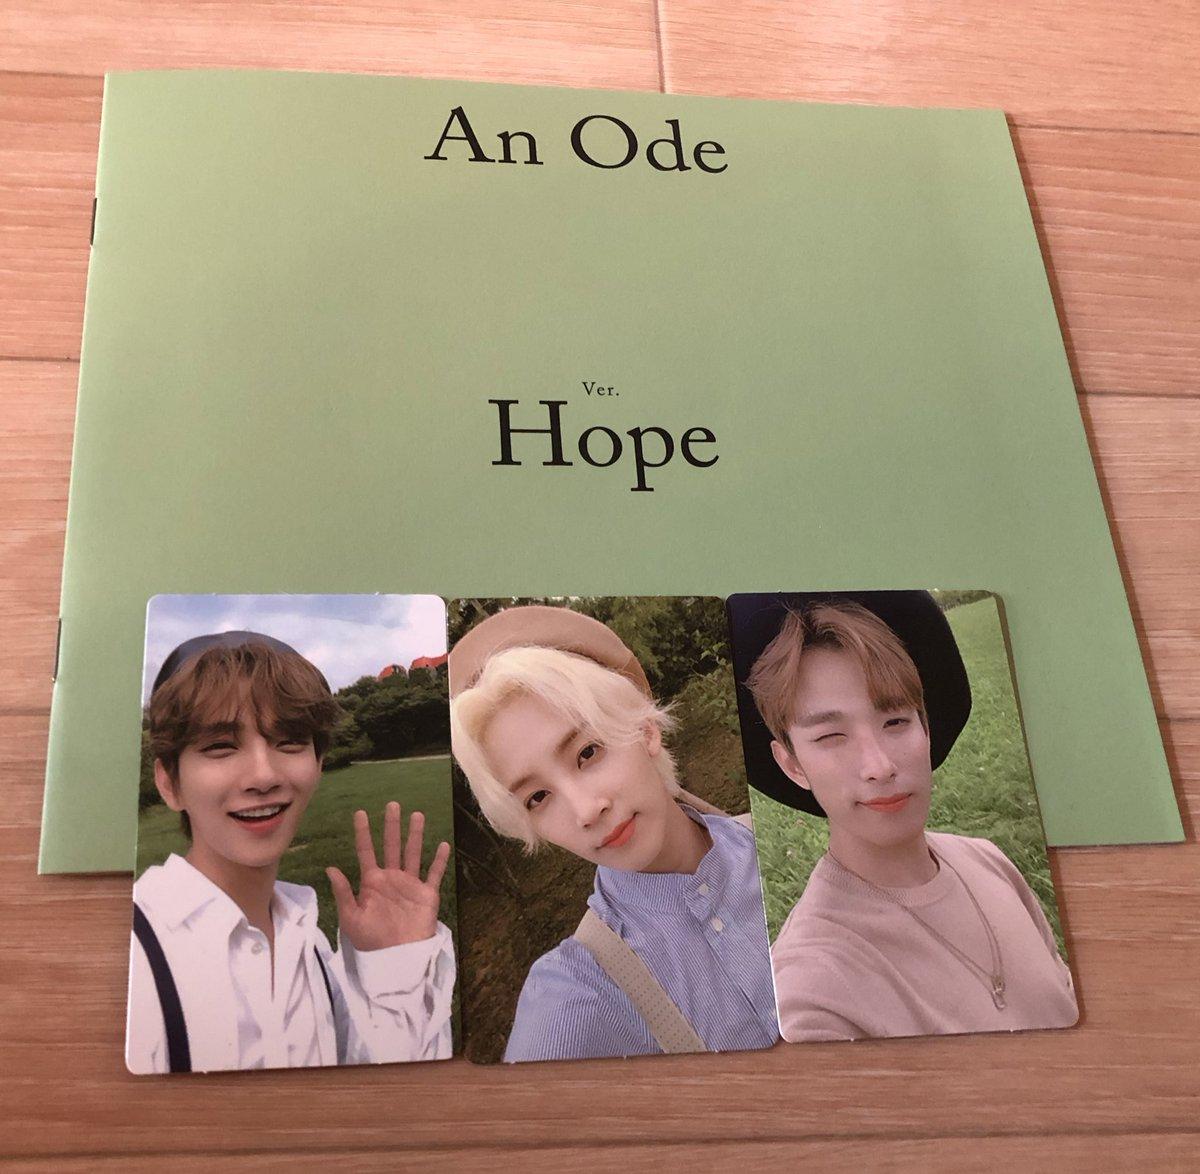 SEVENTEEN AnOde ver Hope トレカ 譲→画像のもの 求→同種のウォヌ、ミンギュ (ウォヌ優先)  郵送での交換希望です 条件の合う方いましたらリプお願います🤲  #SEVENTEEN #トレカ #ジョンハン #ドギョム #ジス #スングァン https://t.co/YimC3zKXOv